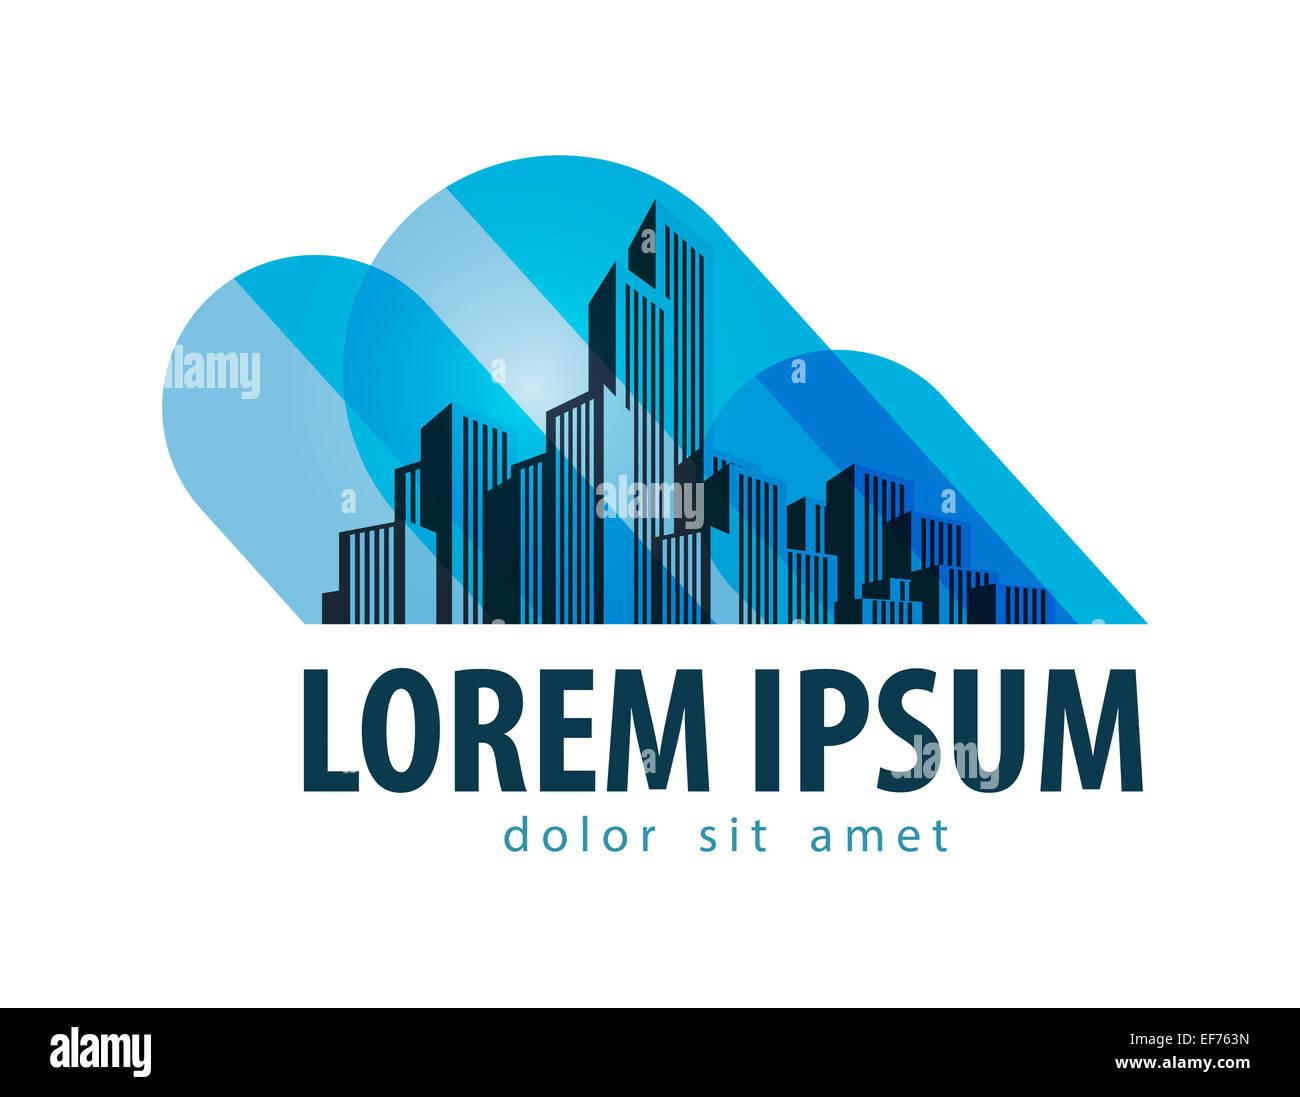 City vector logo design template. building or architecture icon. - Stock Image